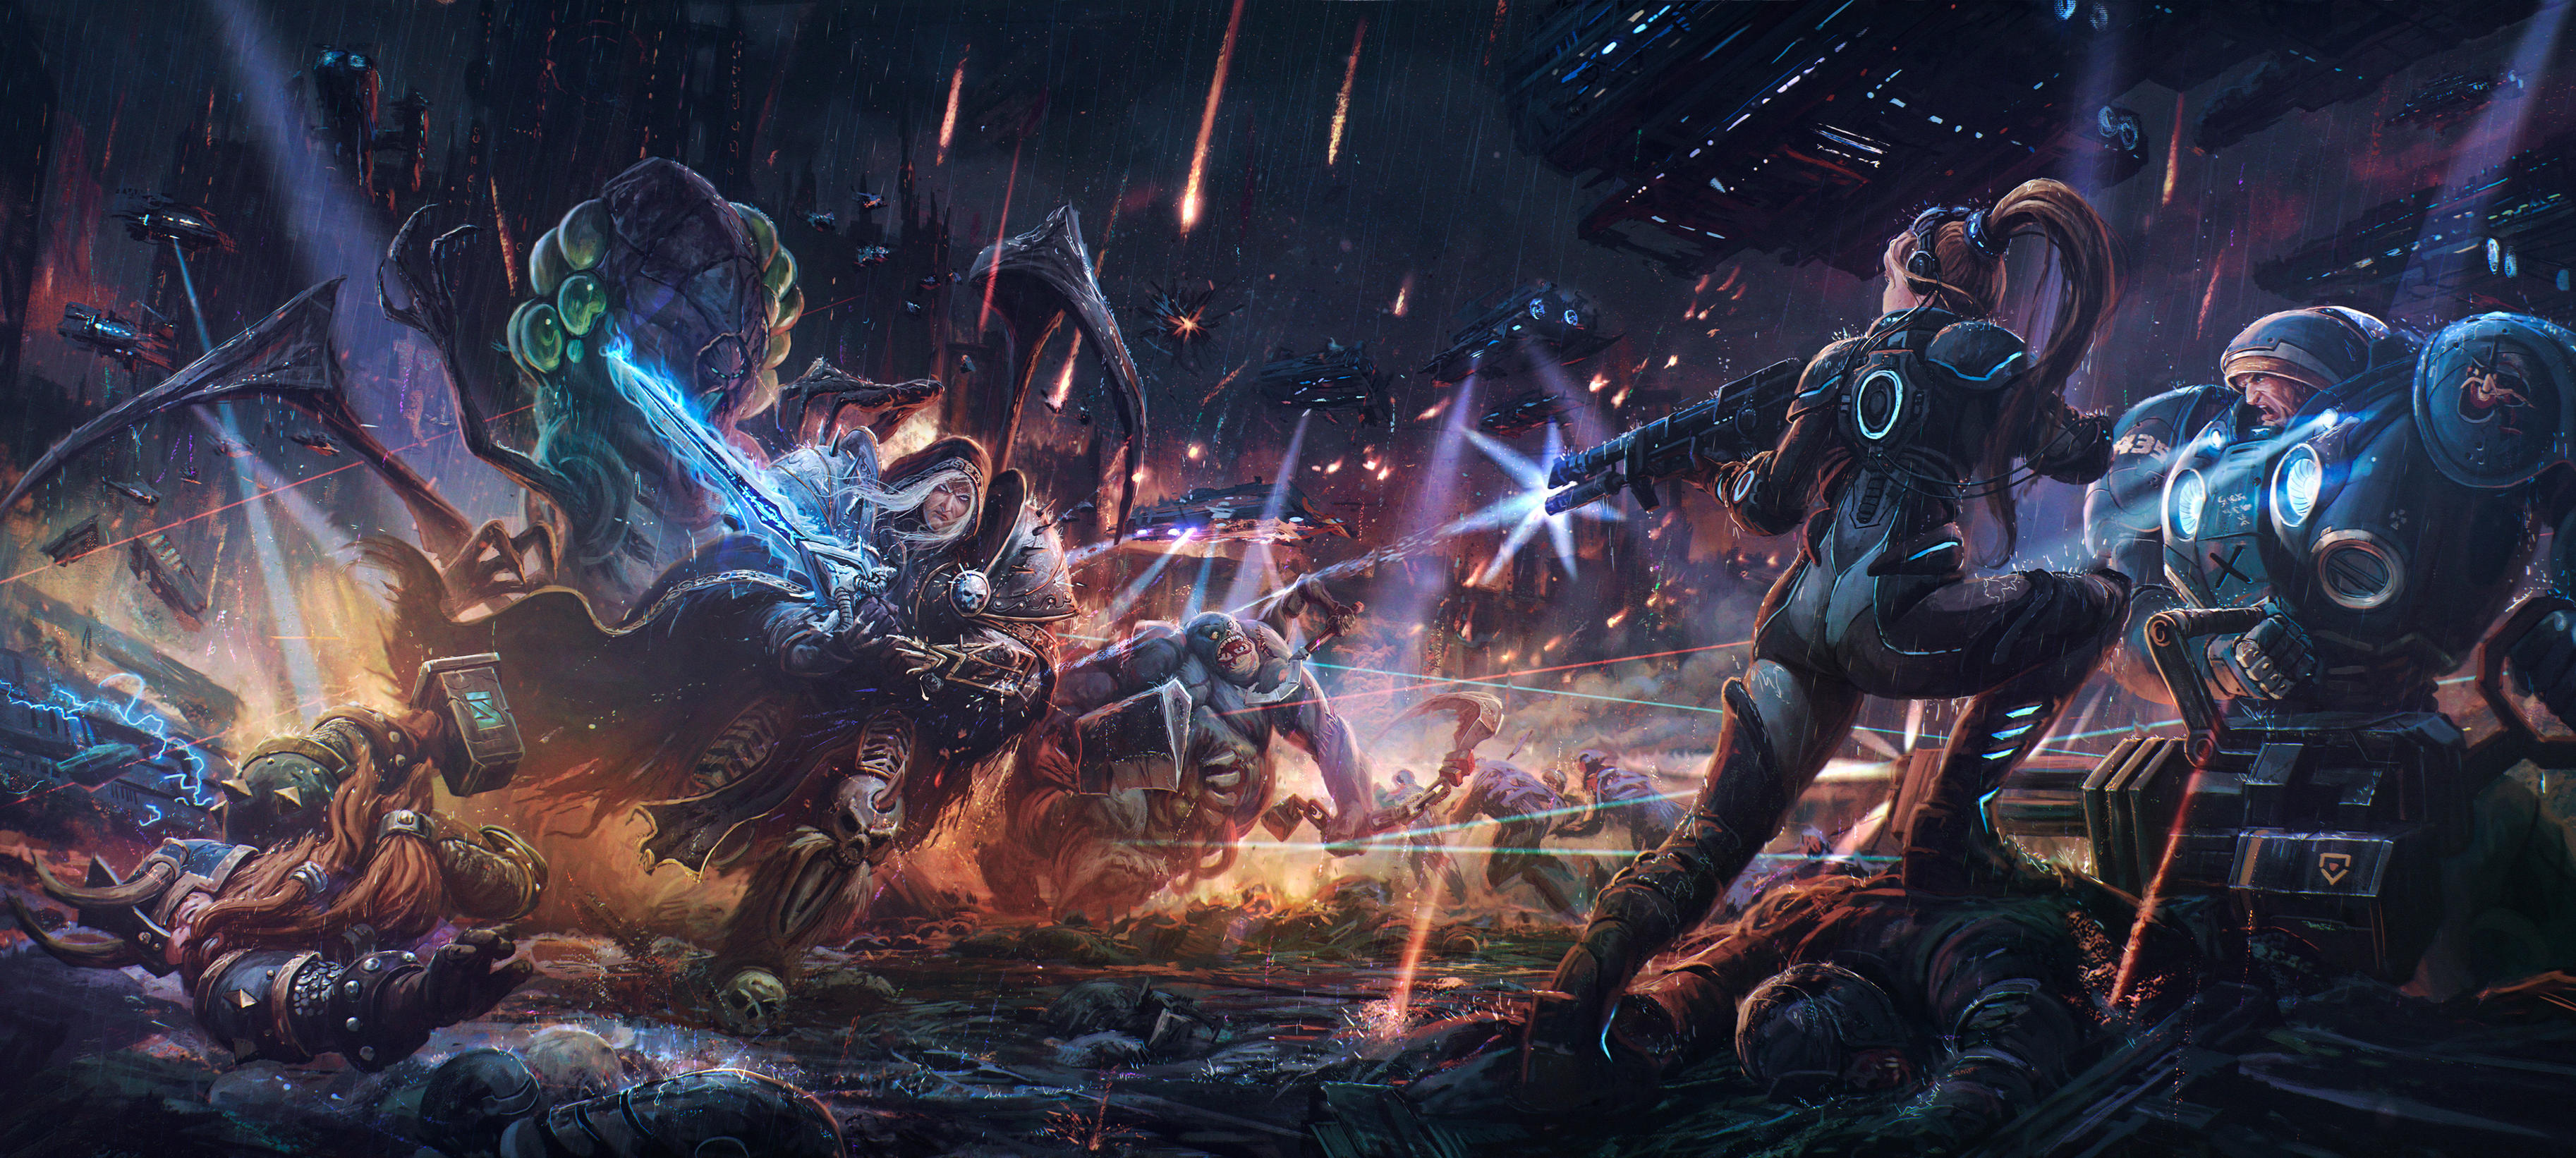 Heroes of the storm: Rhapsody by sswanderer